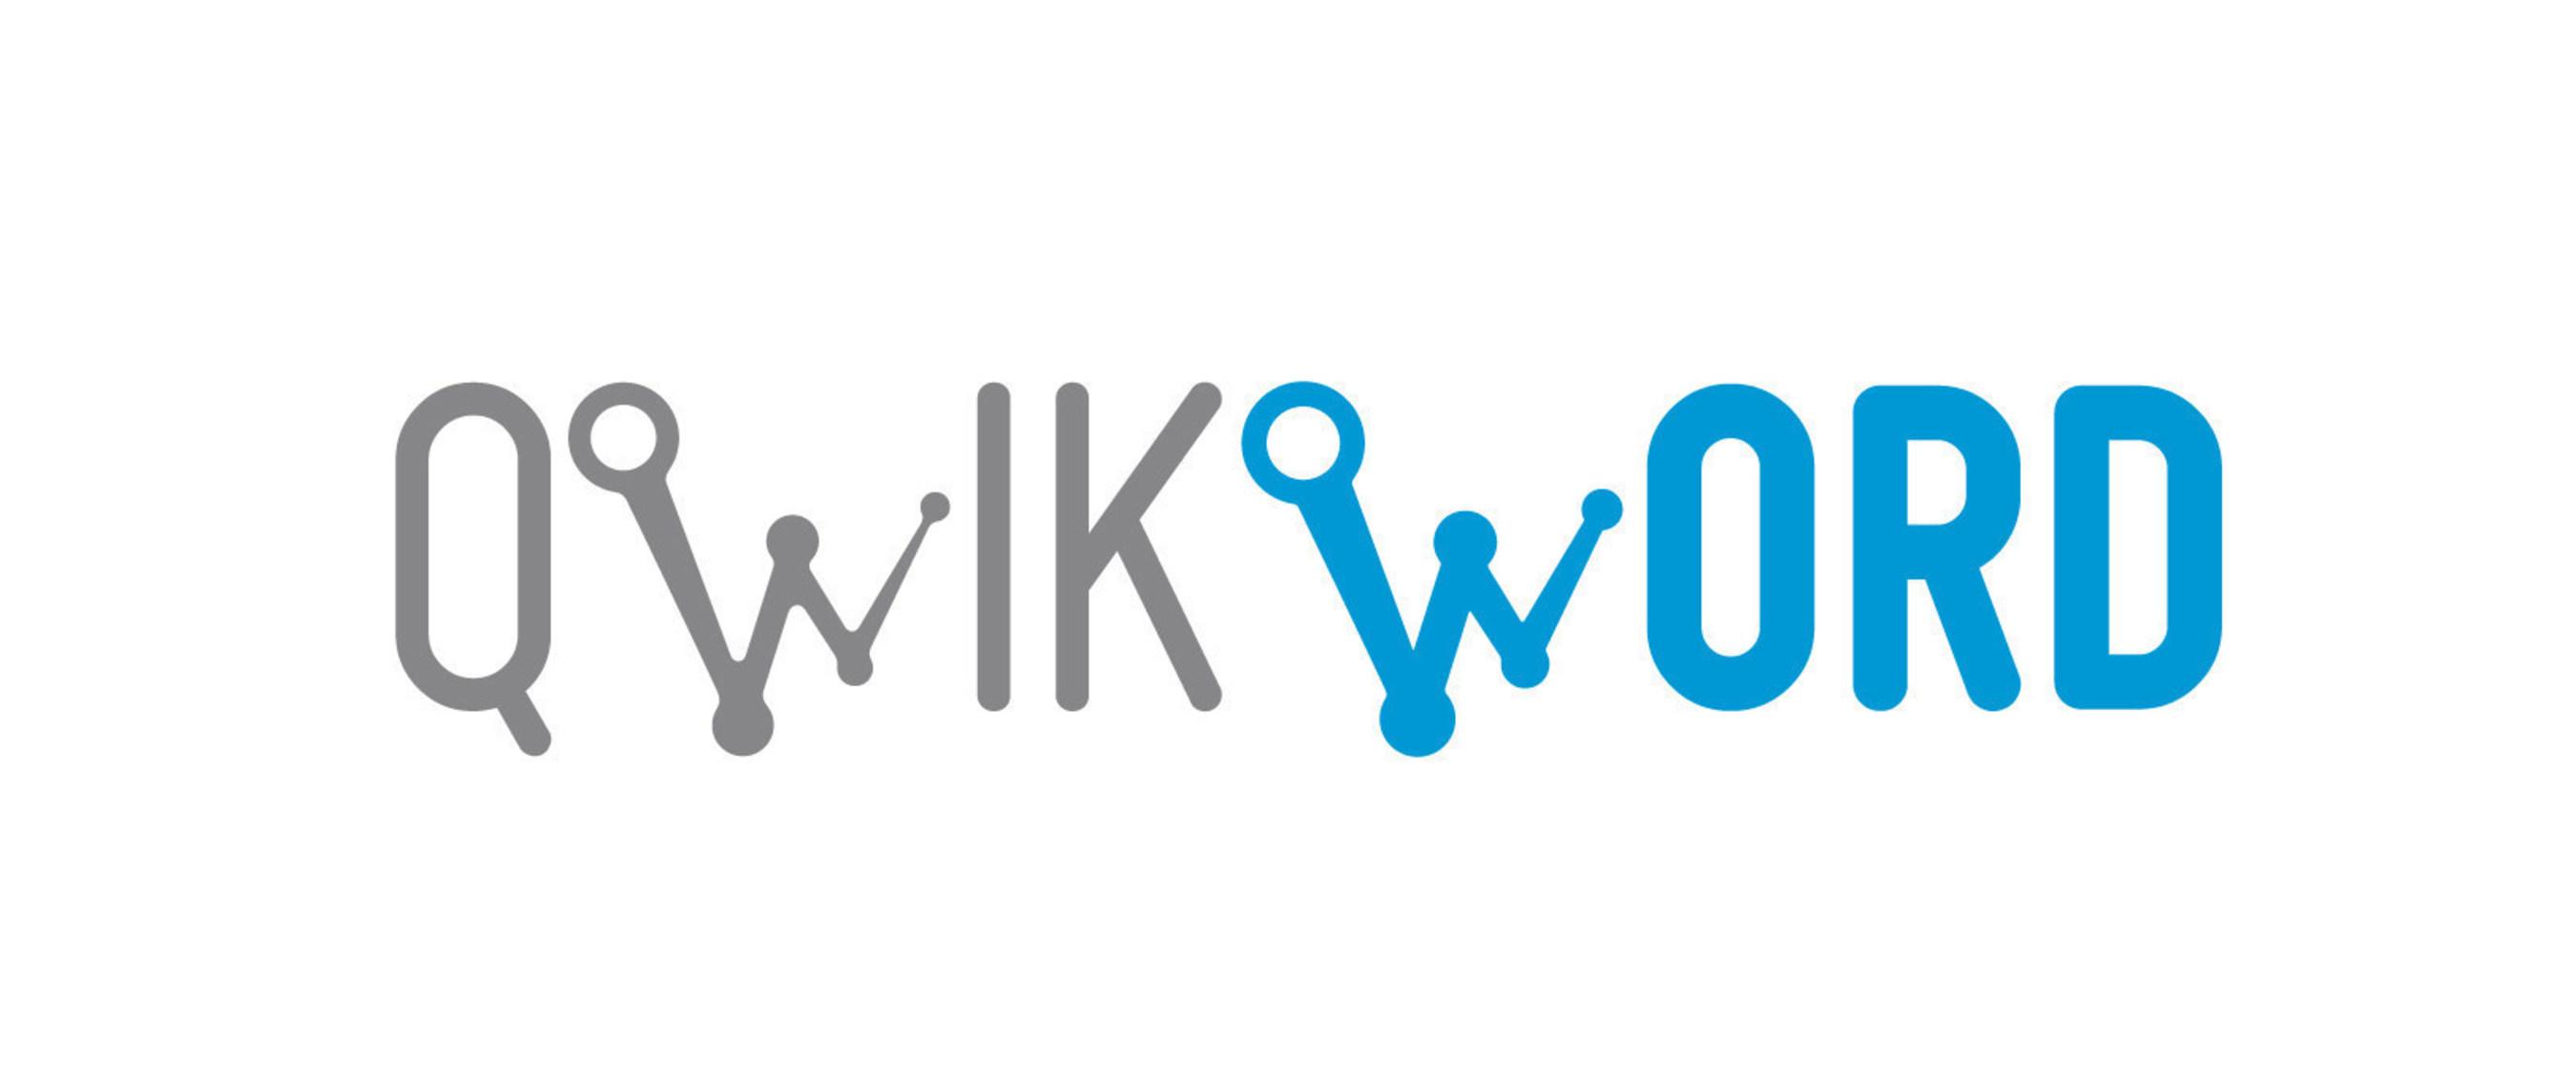 Qwikword se lanza en Apps World en San Francisco